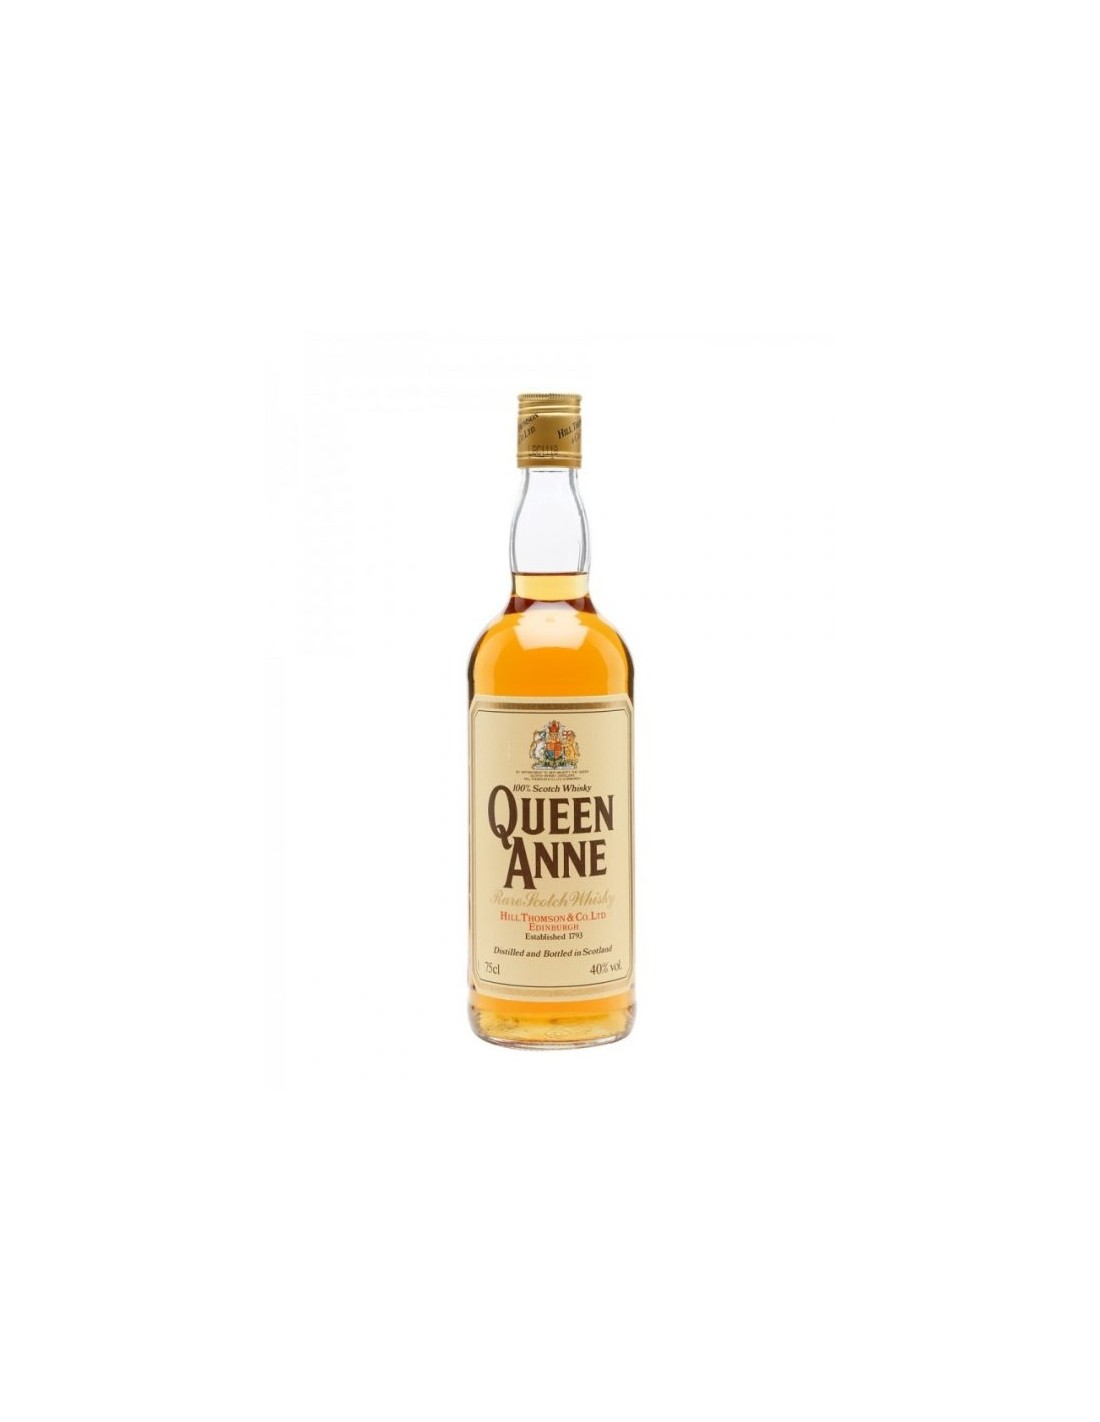 Whisky Queen Anne, 40% alc., 0.7L, Scotia